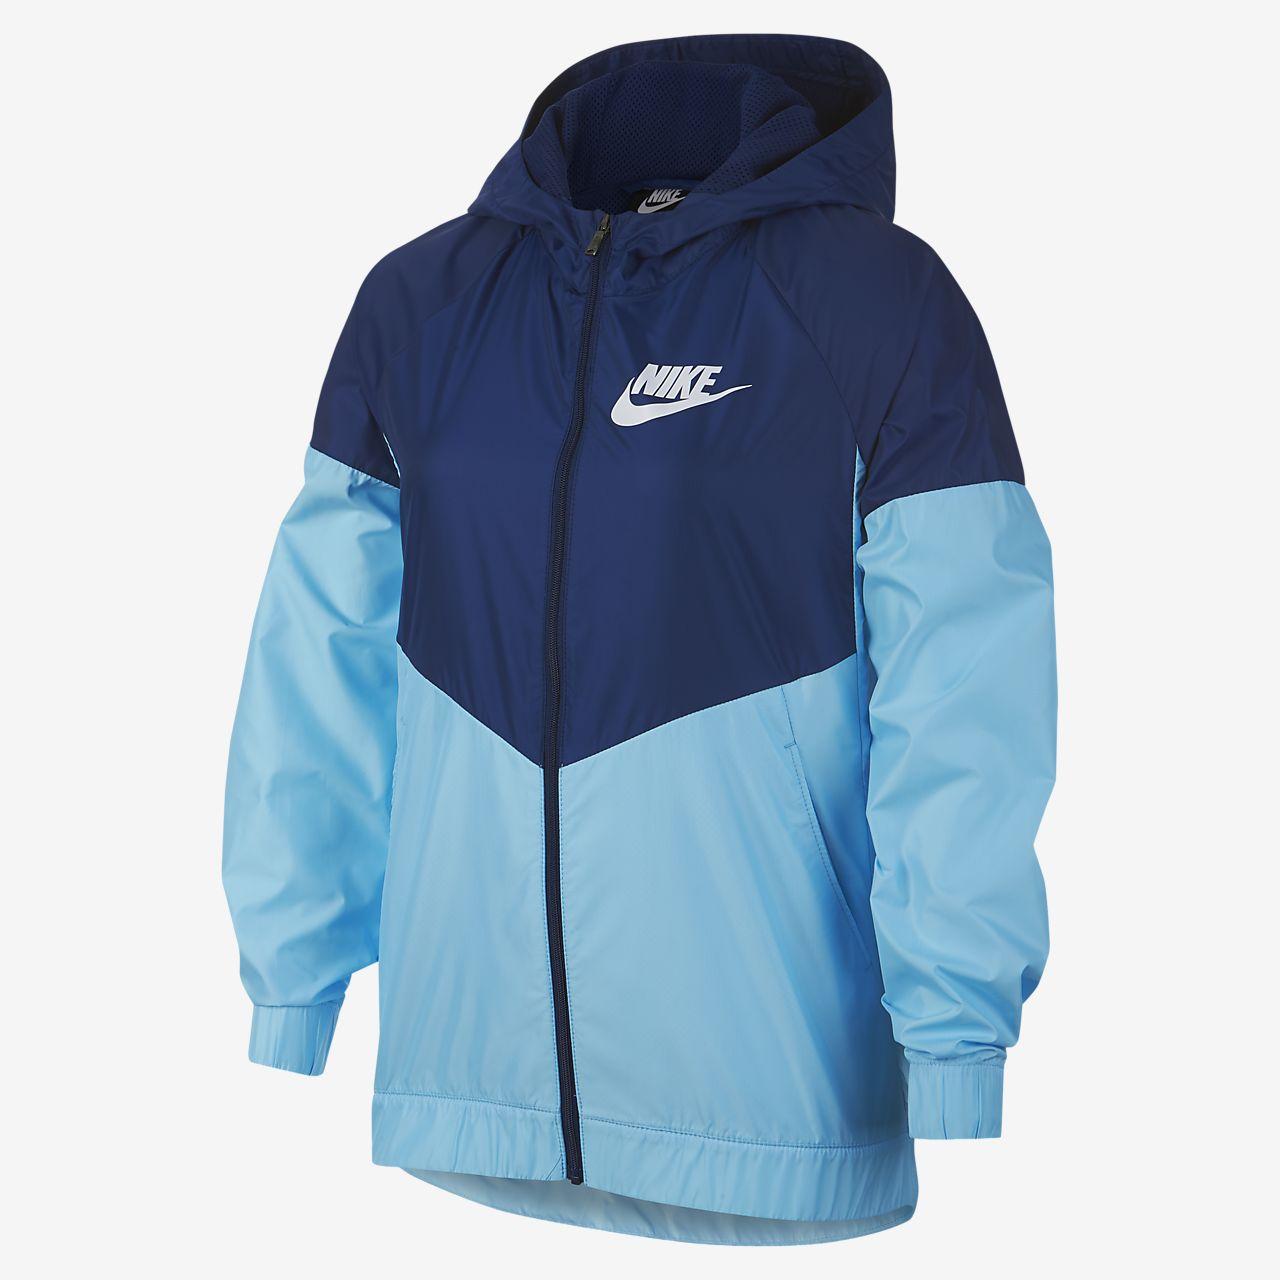 6c743c14fe01 Nike Sportswear Windrunner Jacke für ältere Kinder (Mädchen). Nike ...